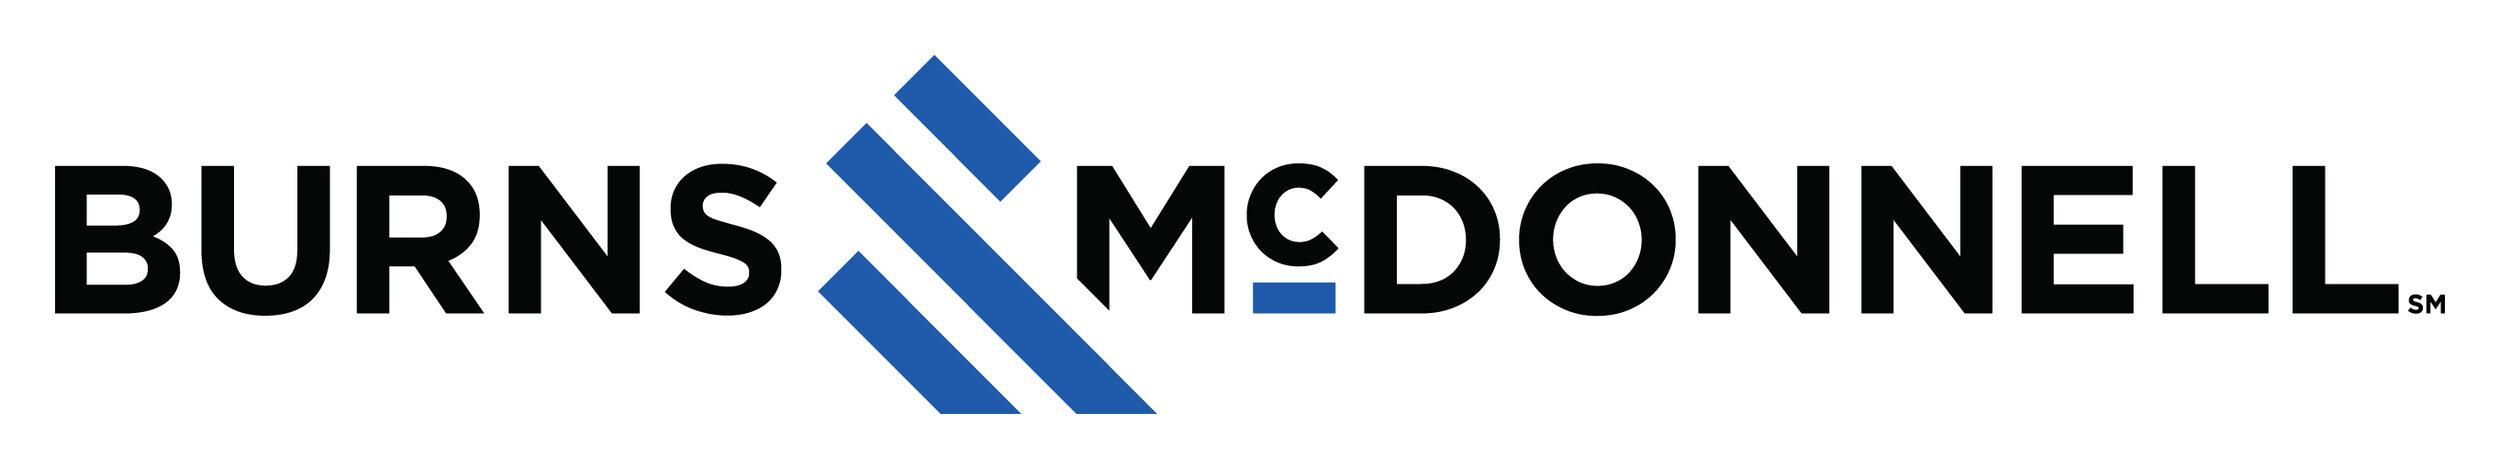 Burns and McDonnell logo 2016.jpg